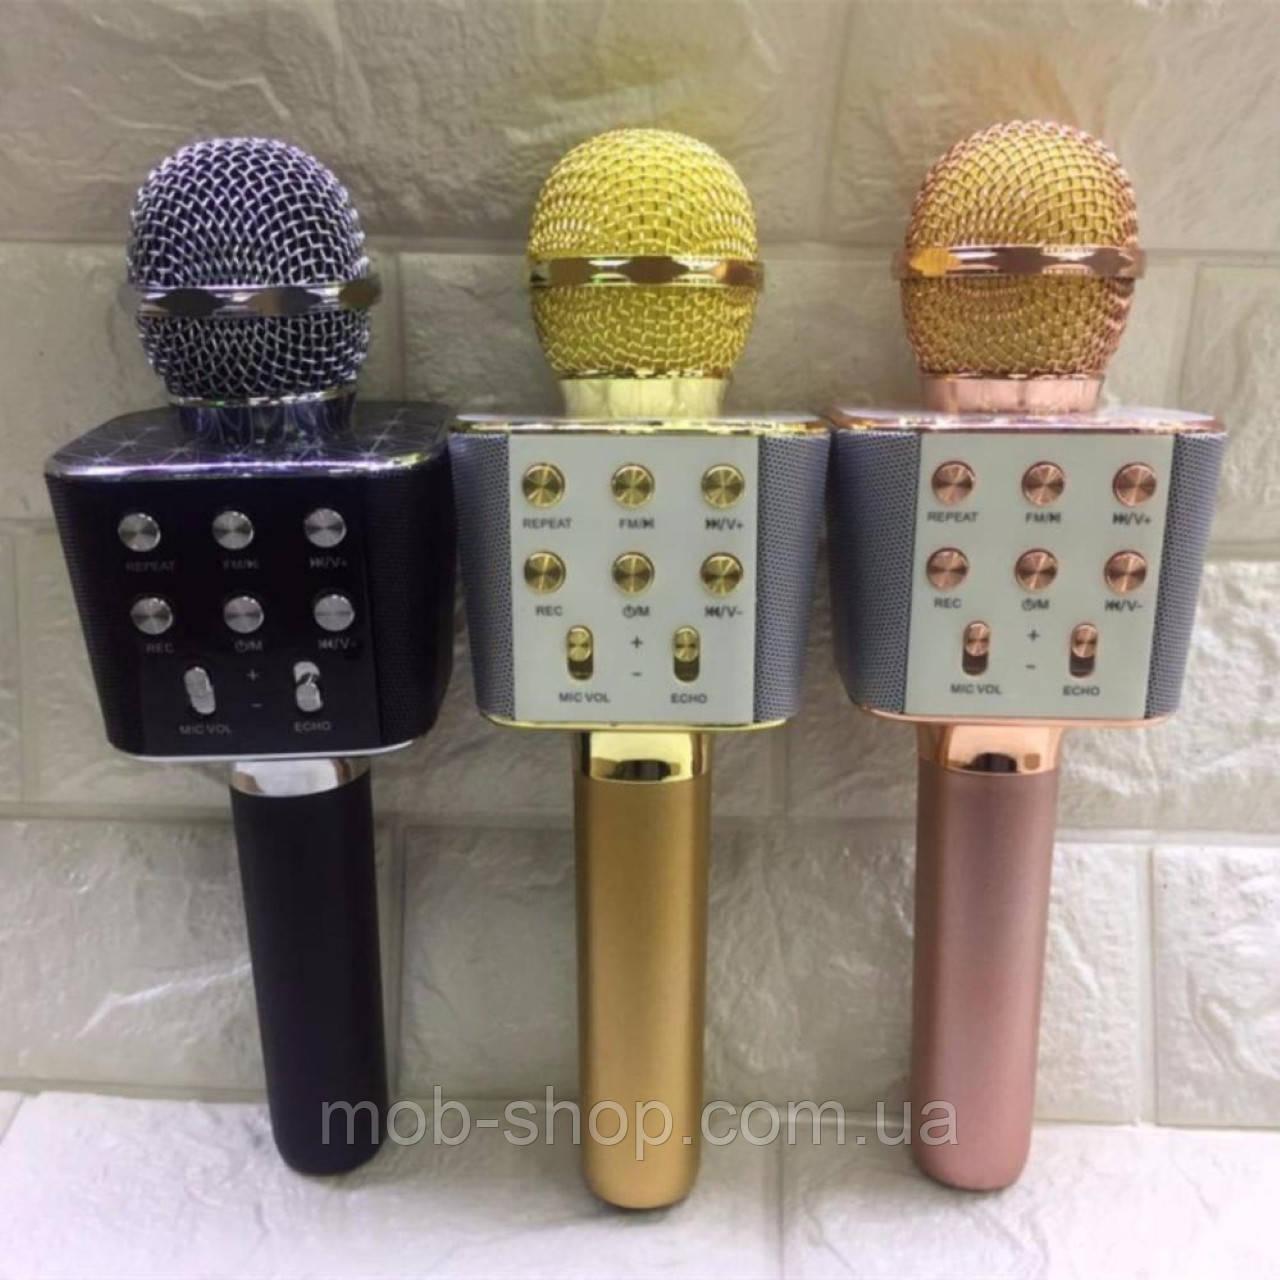 Микрофон для караоке Wster WS-1688 Bluetooth USB с динамиками